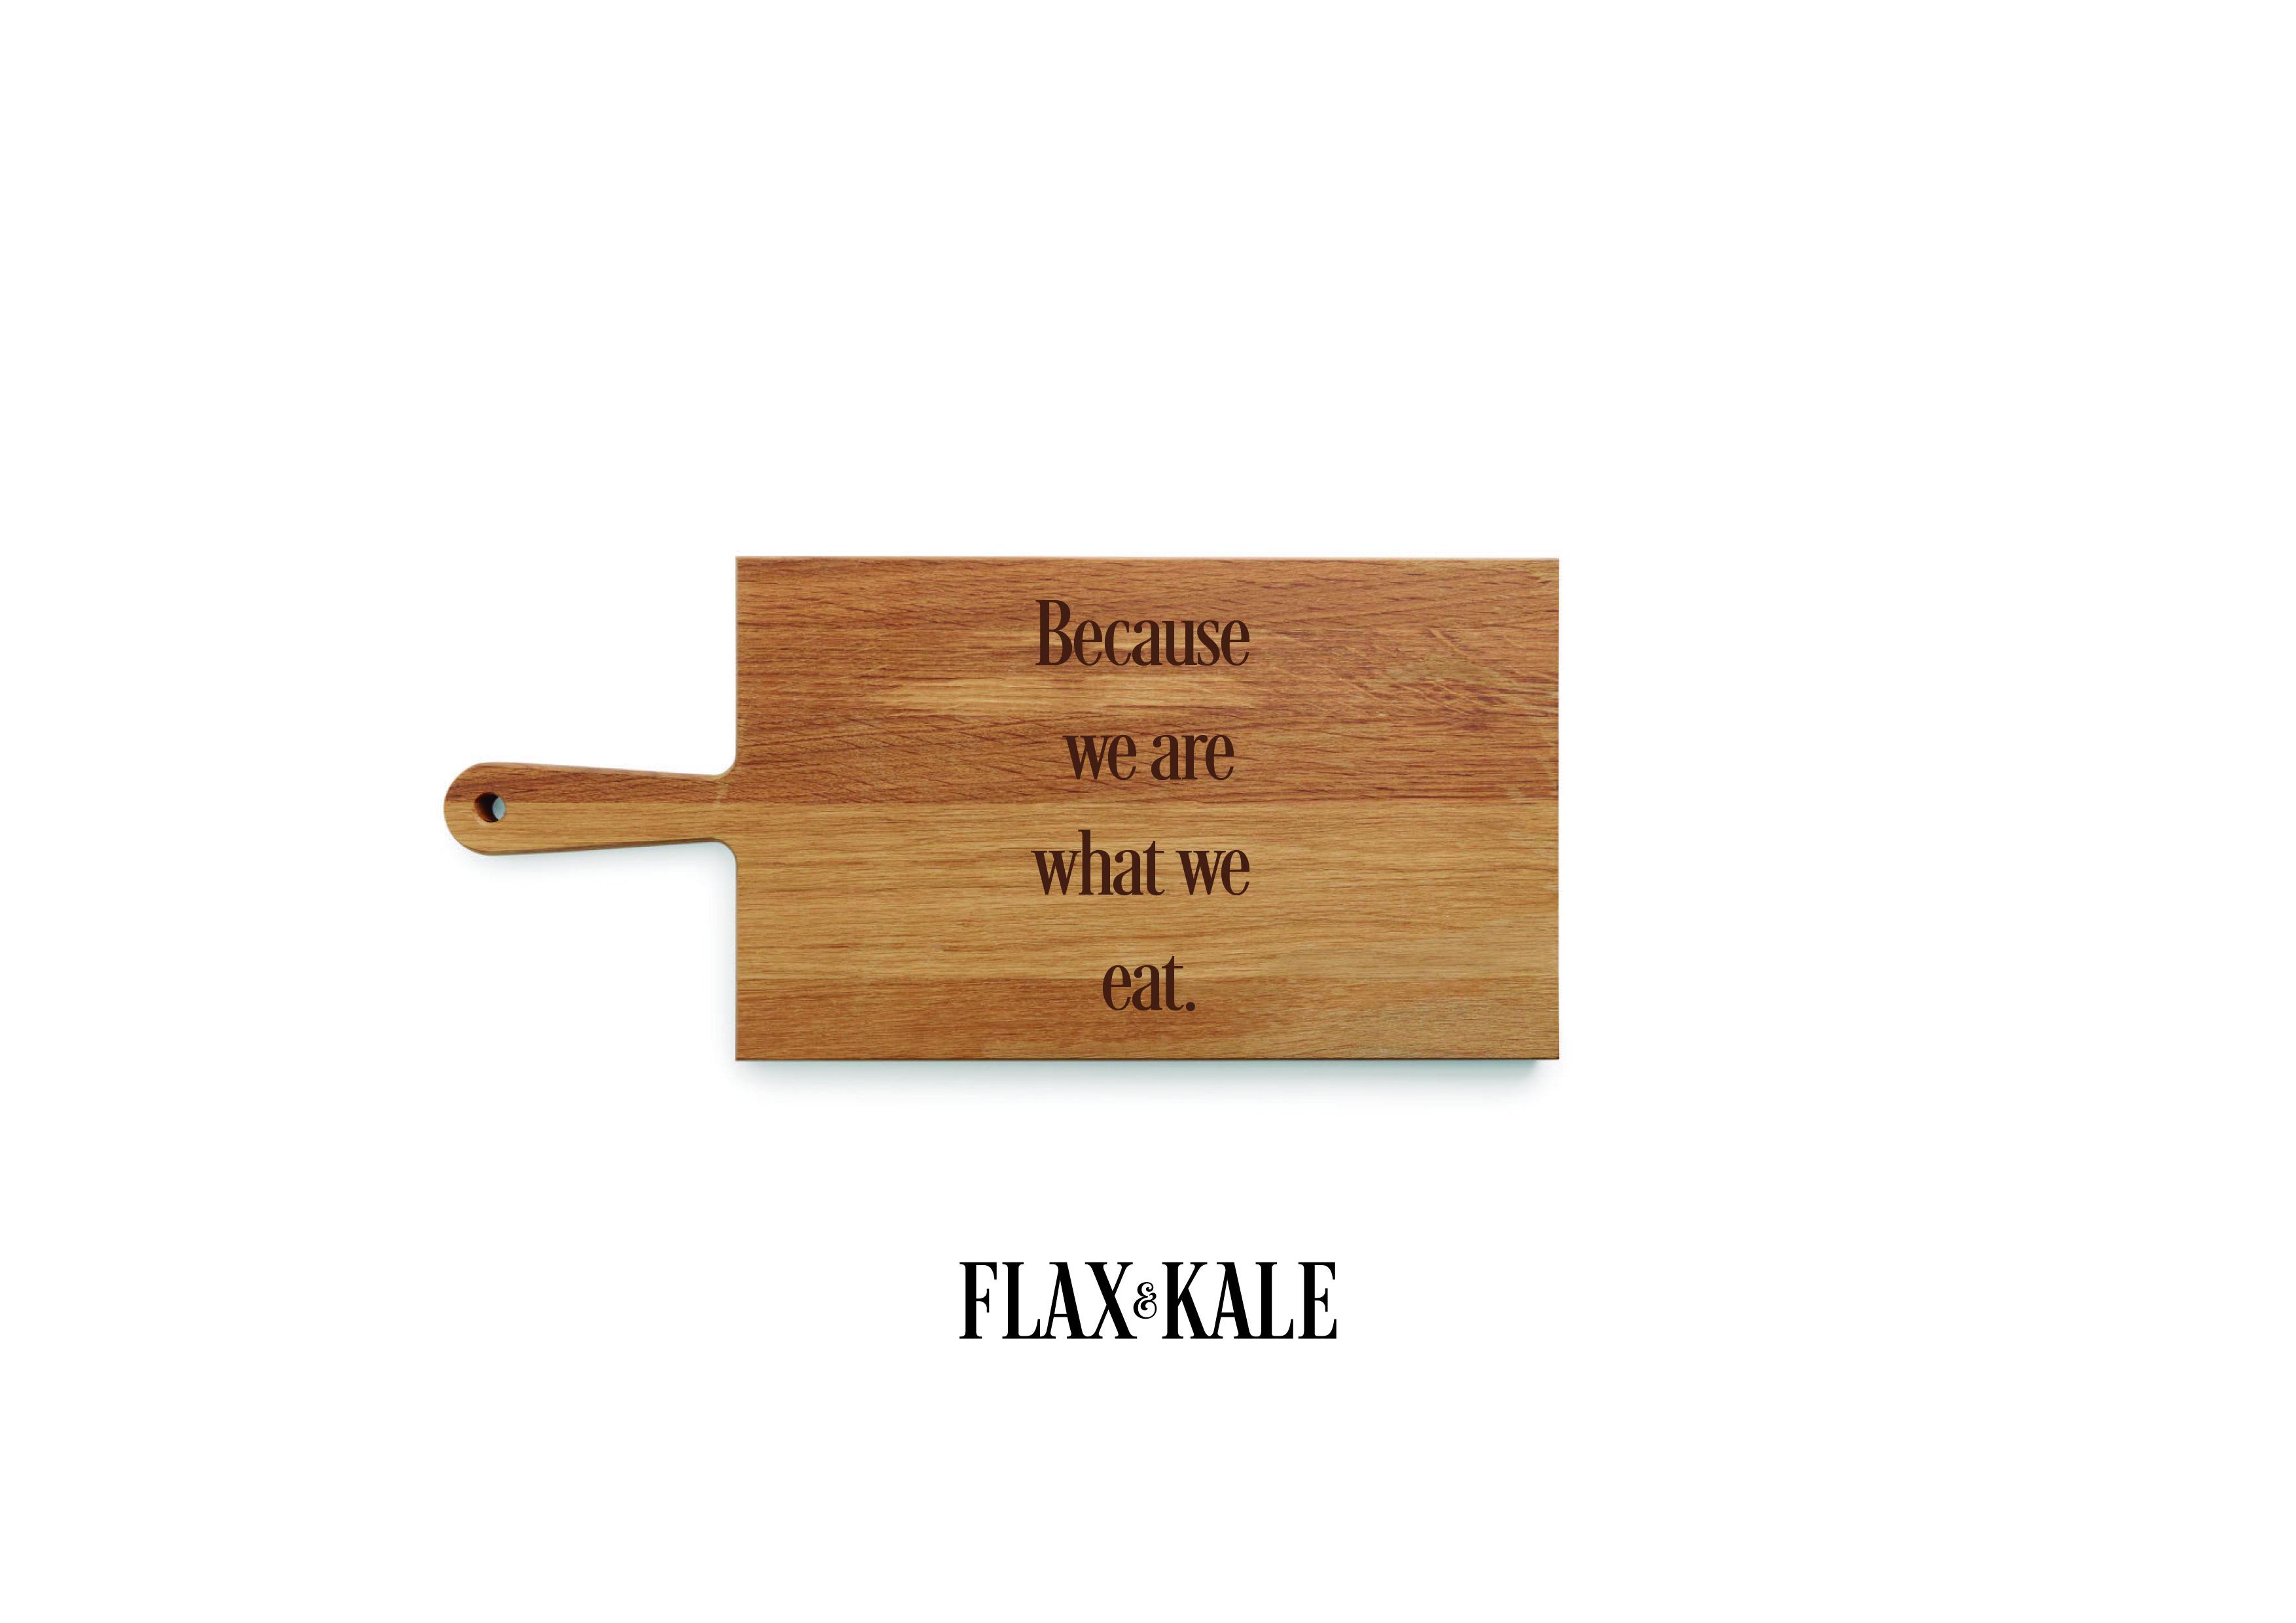 FLAX&KALE FINAL-14